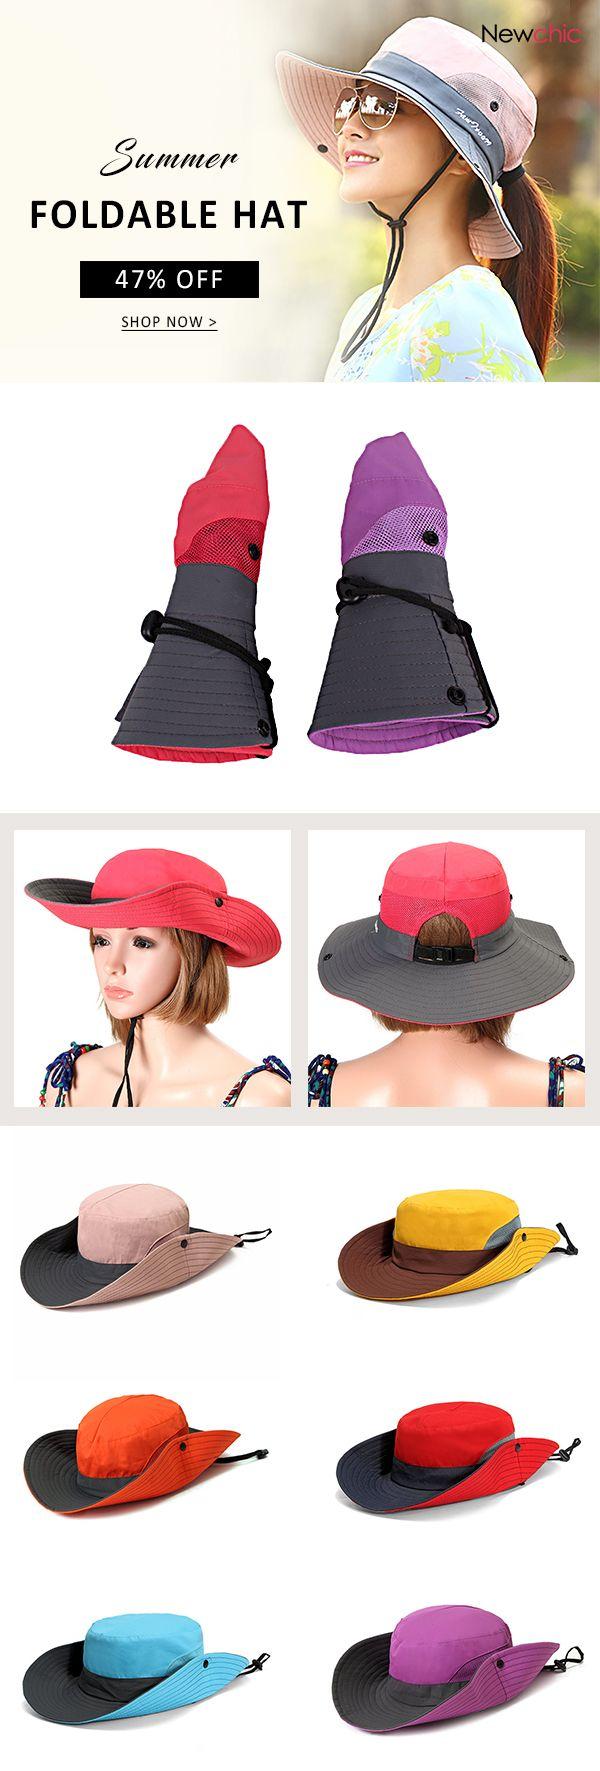 2f1895cbb47 Women Summer Foldable Mesh Breathable Anti-UV Fisherman Hat Outdoor Travel  Sunscreen Bucket Hat  hat  accessories